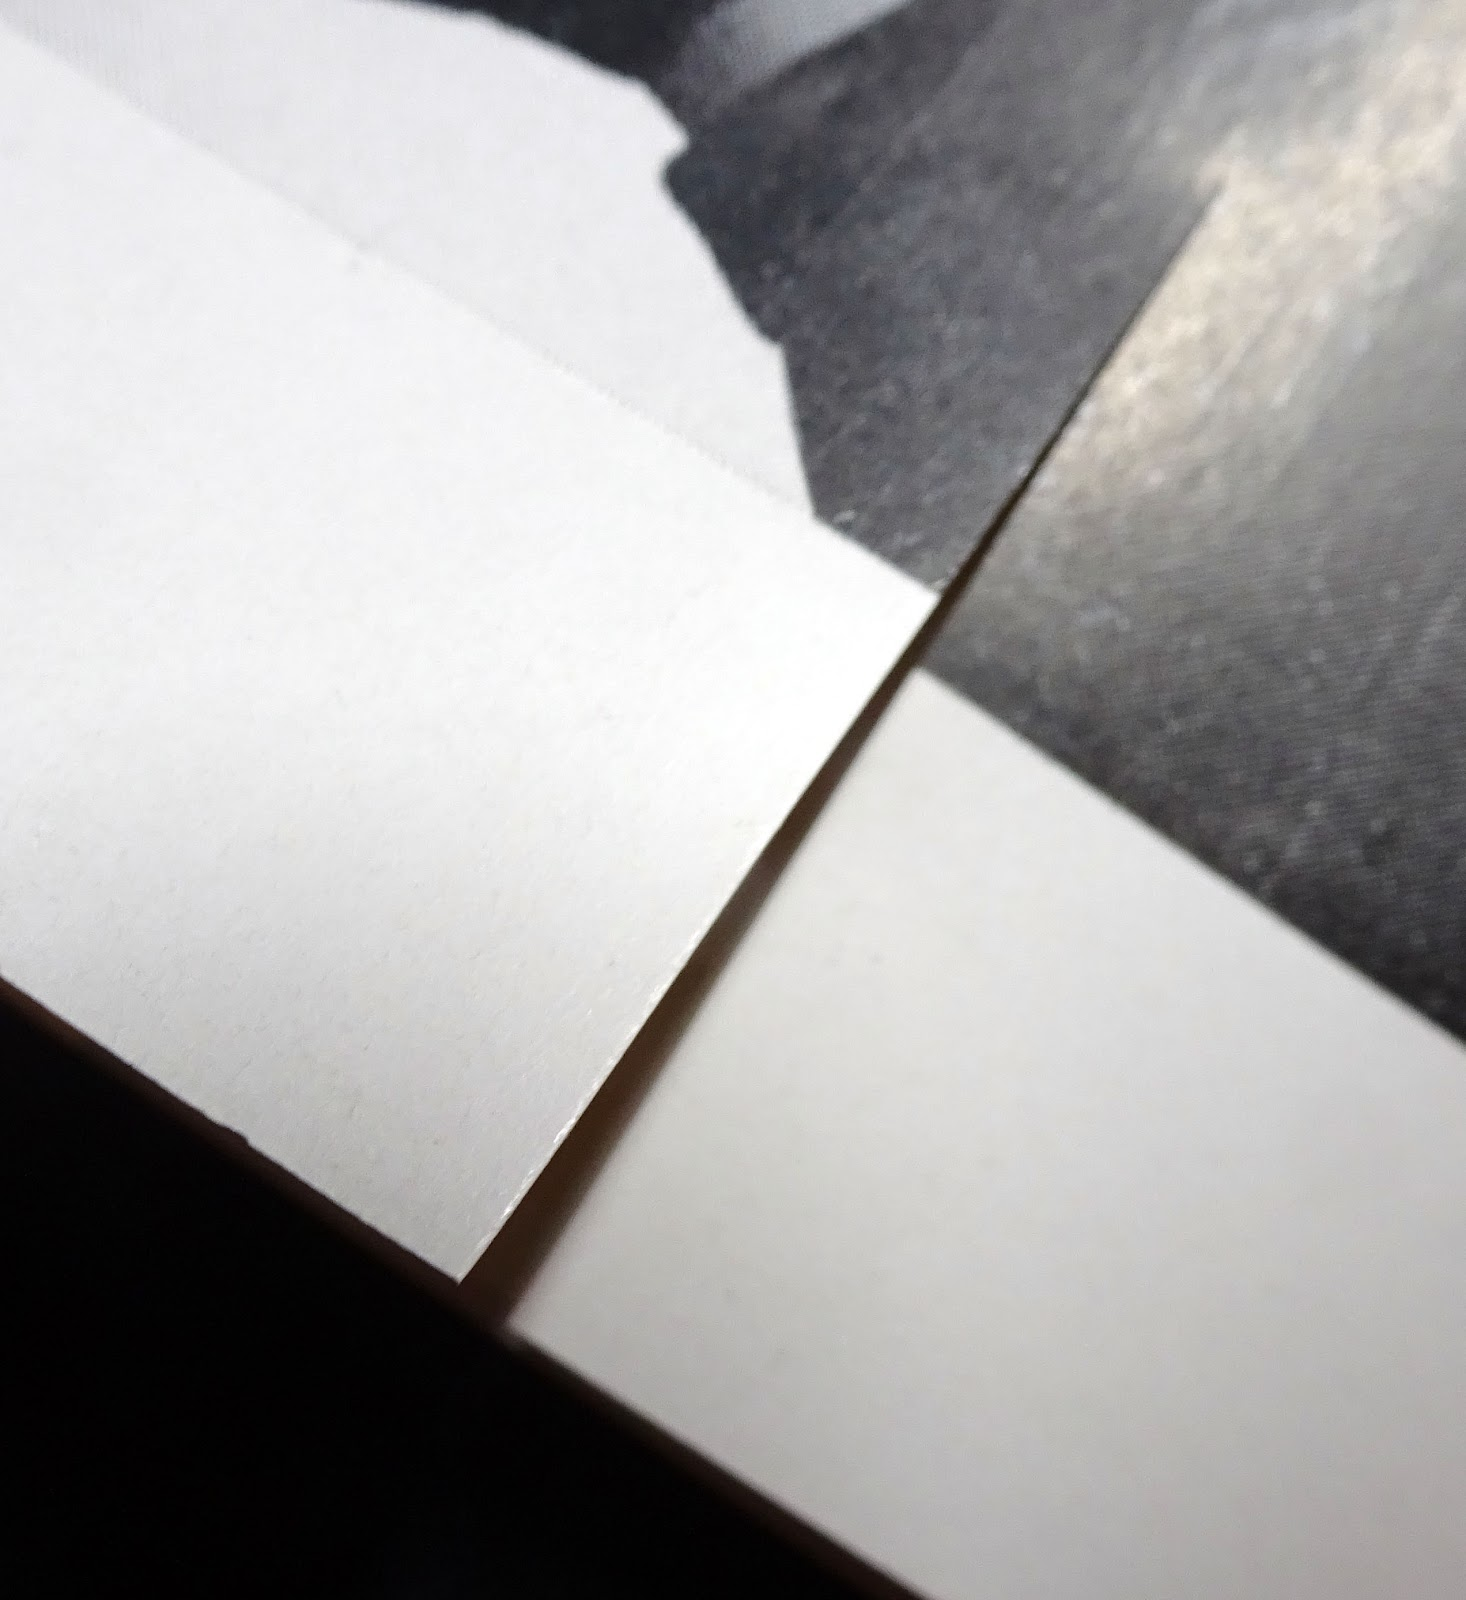 Cut on paper